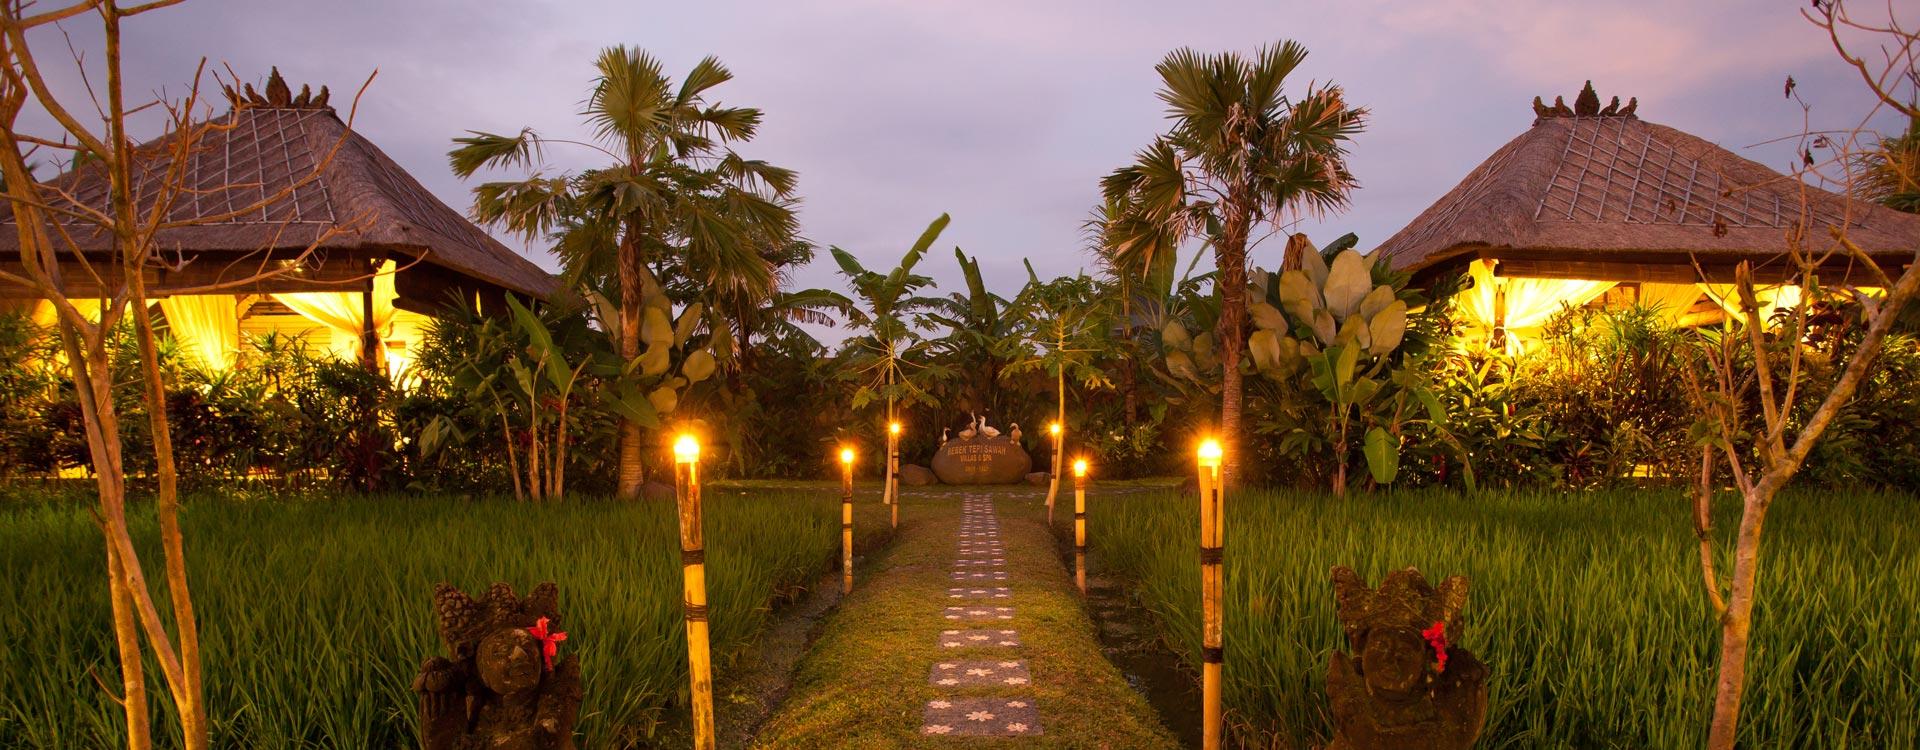 Bebek Tepi Sawah Restaurant And Villas Spa